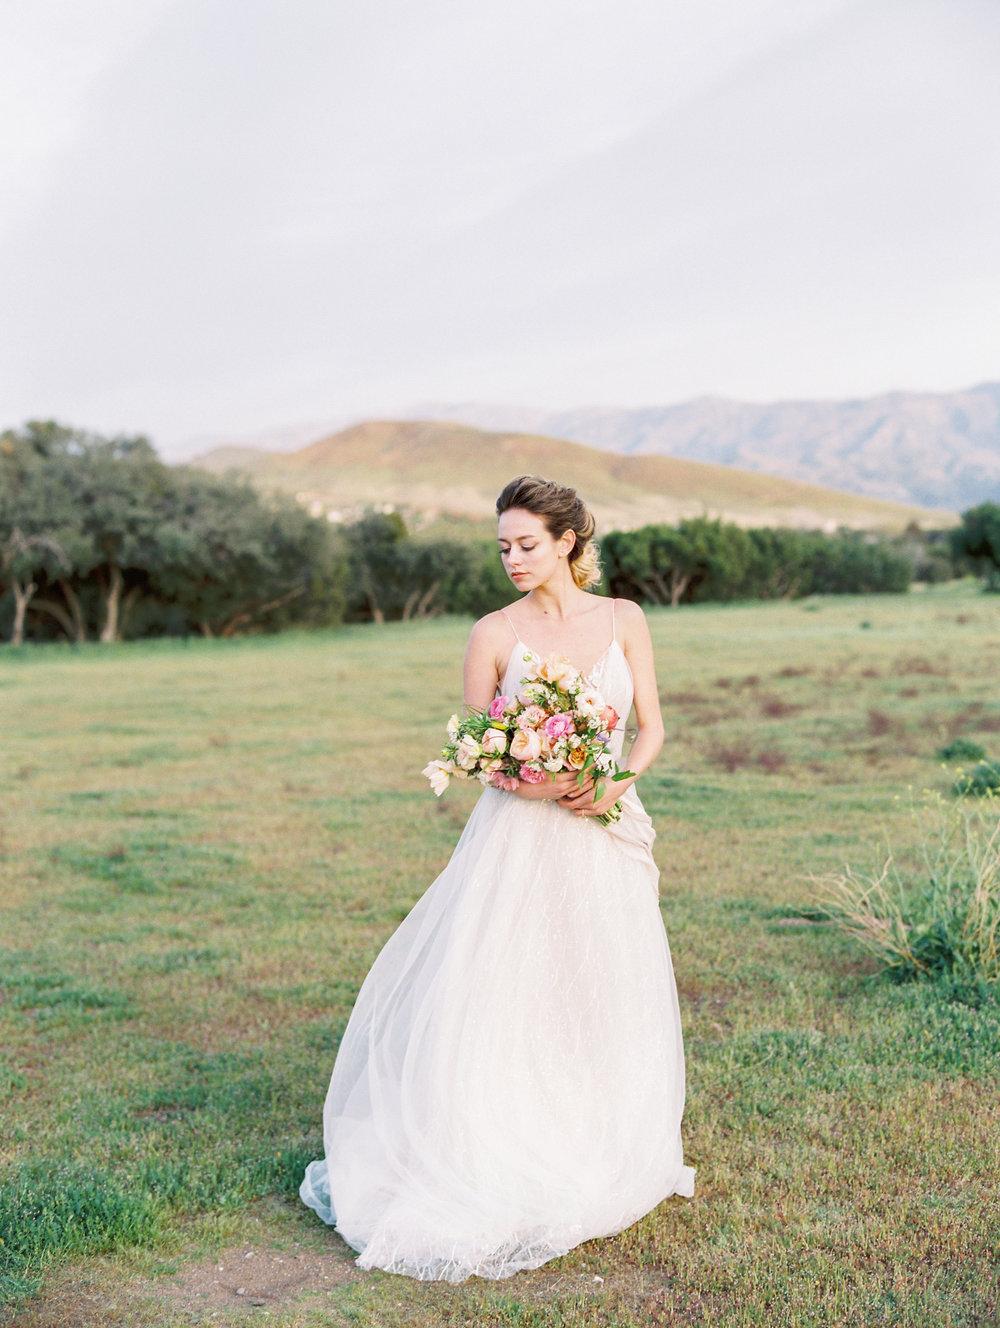 Bridal Bouquet Finding Flower Wedding Florist  St. George Utah California